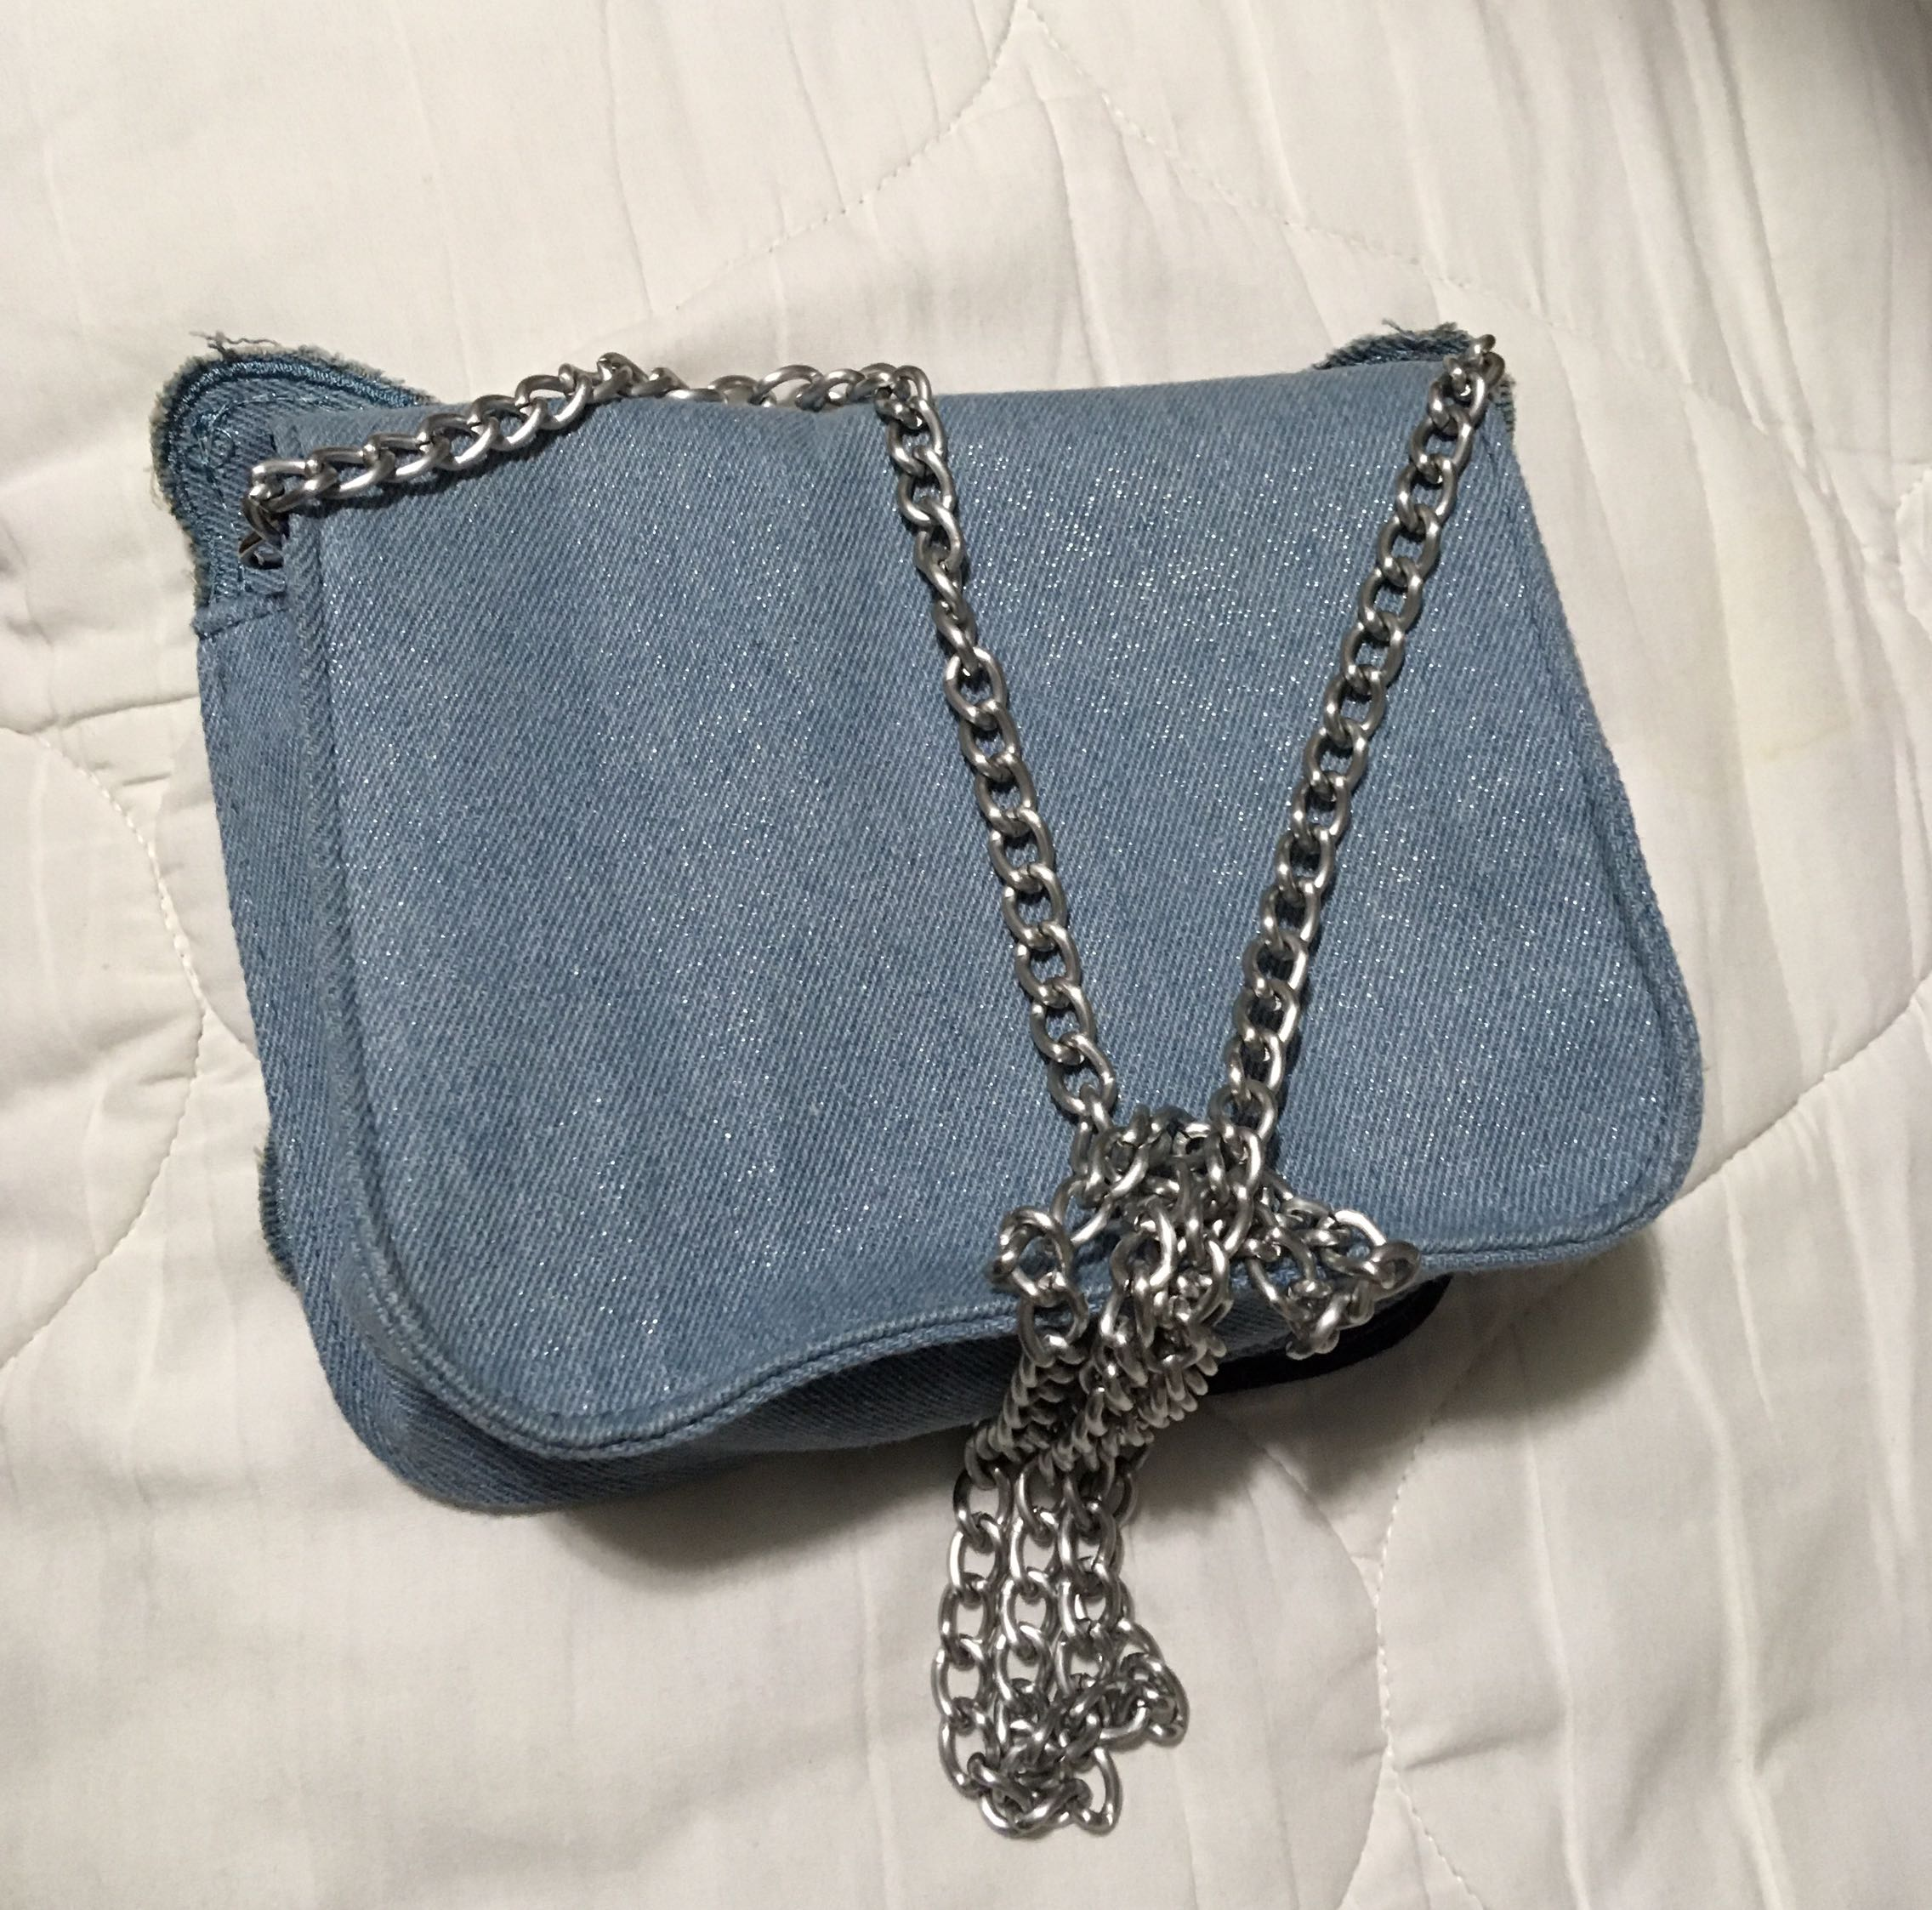 Children's butterfly handbag